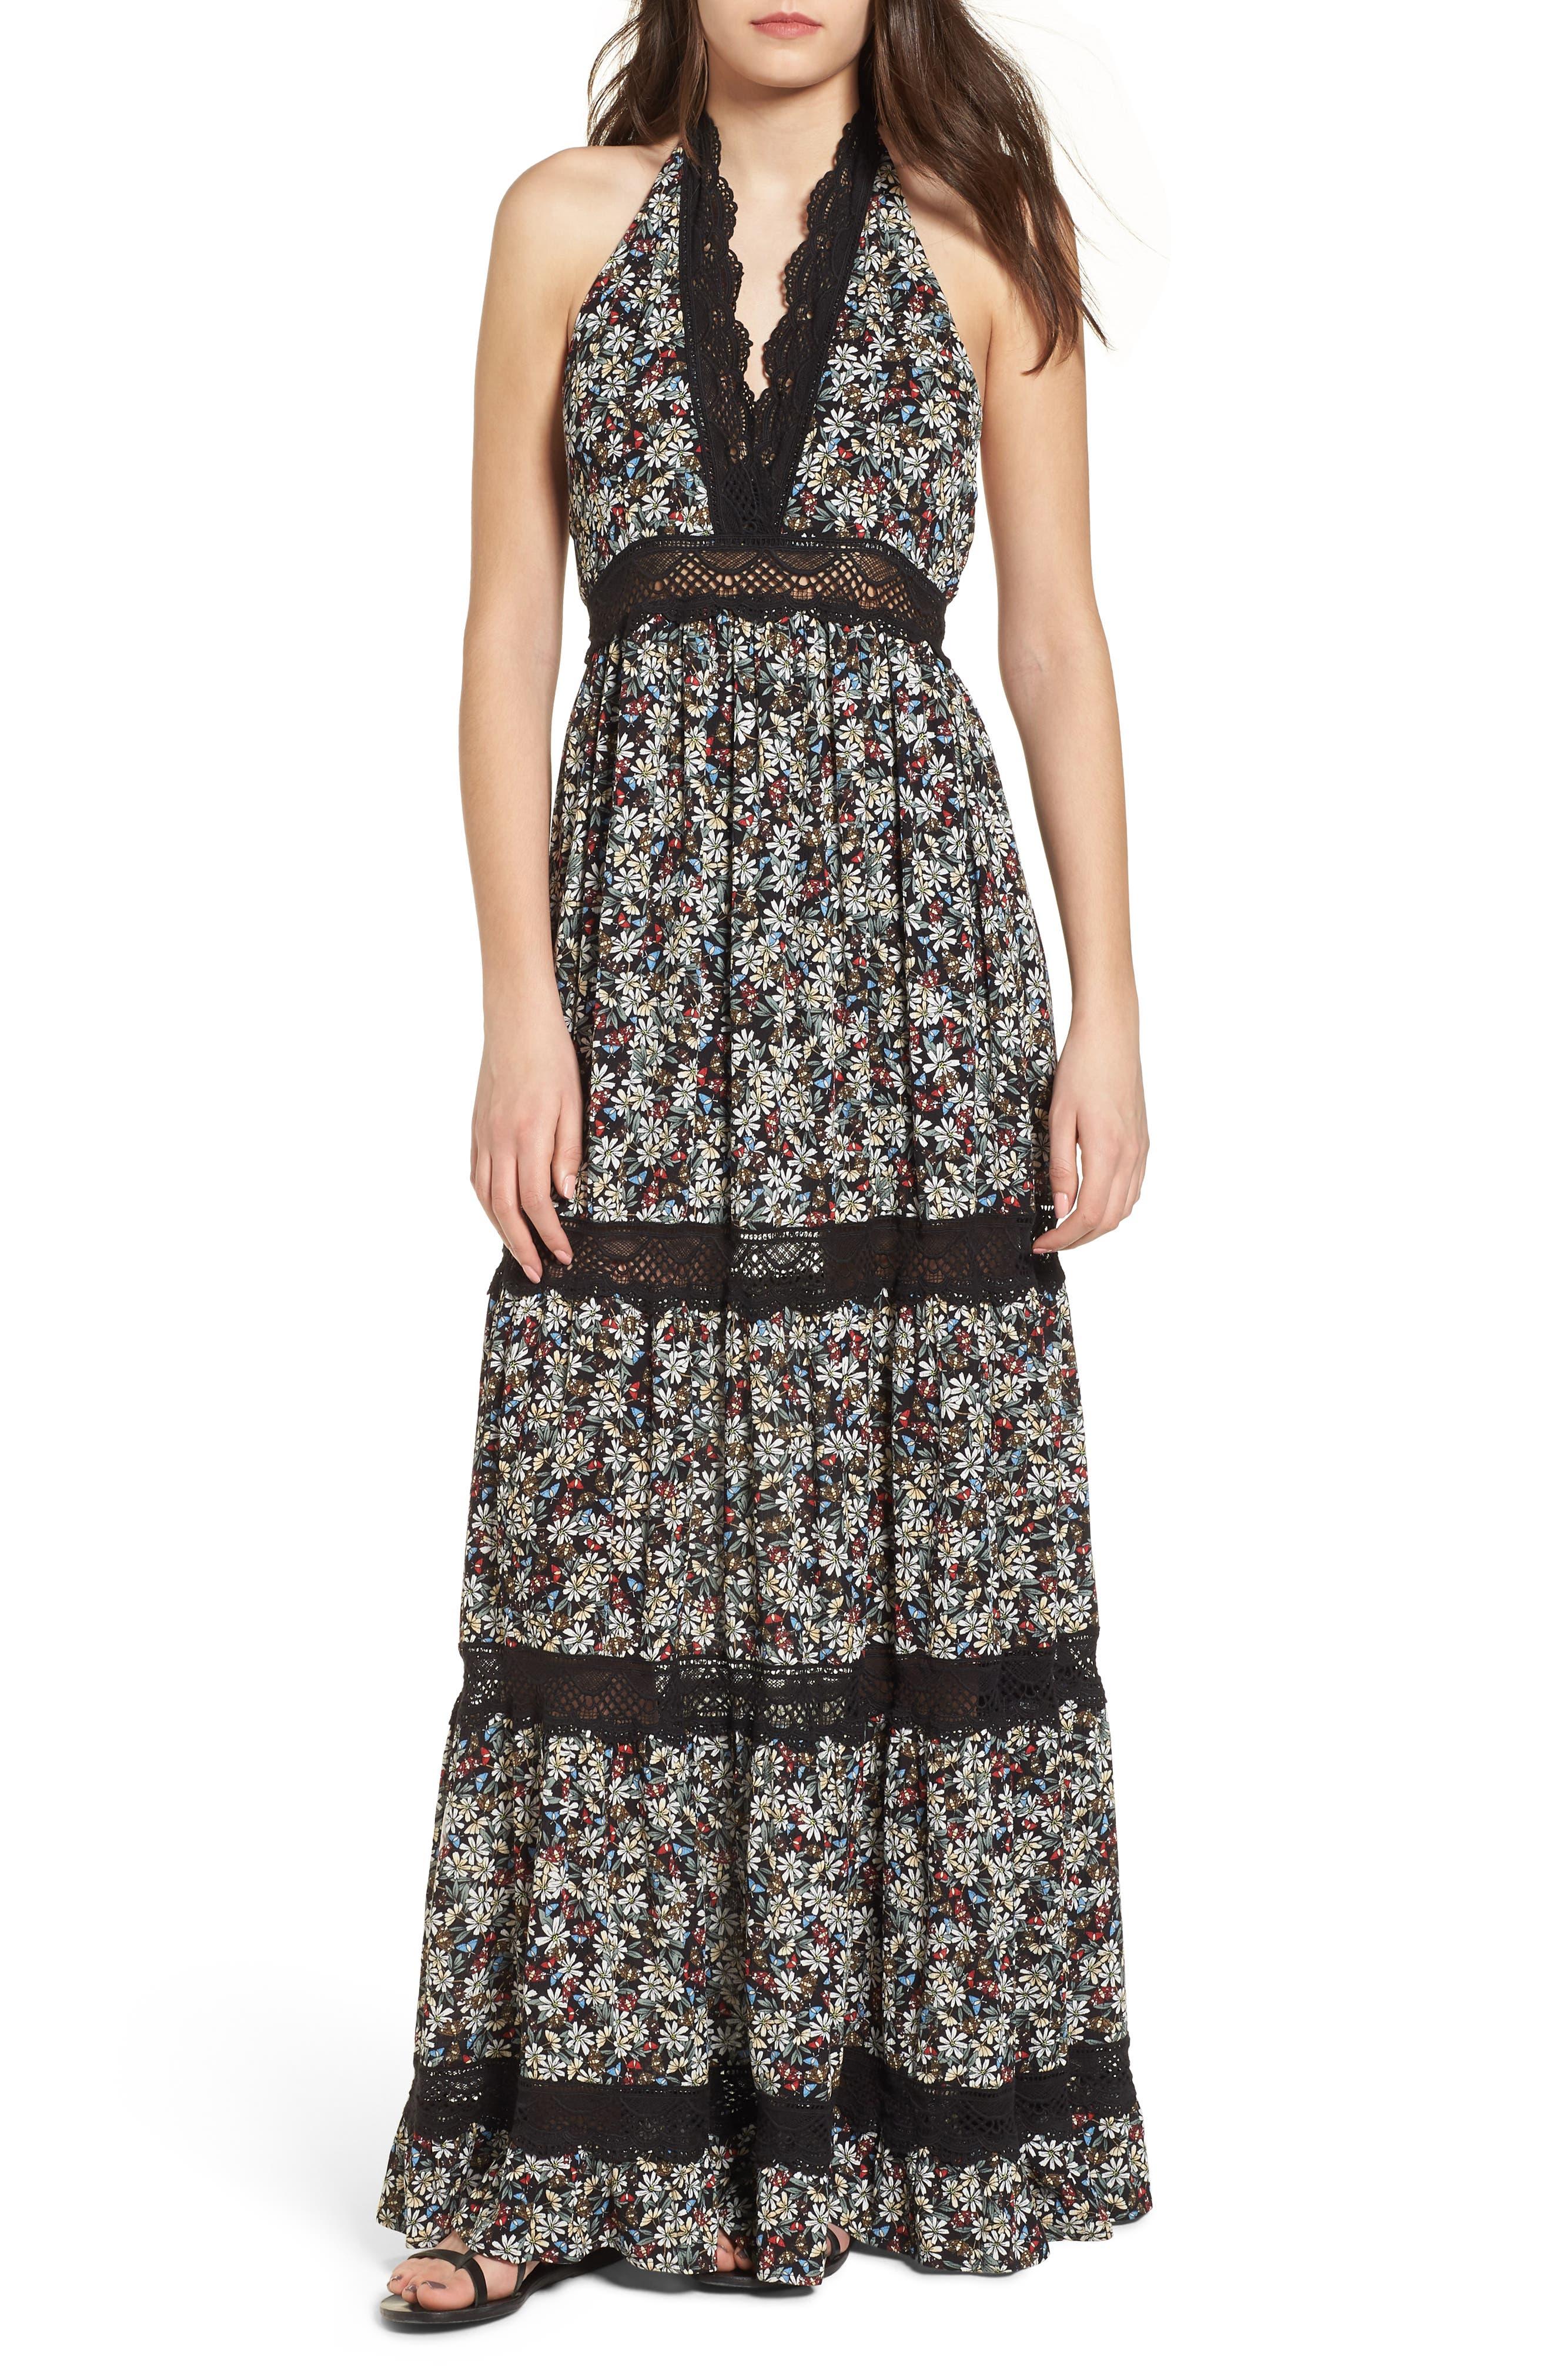 Flora Halter Neck Maxi Dress,                             Main thumbnail 1, color,                             Multi Black